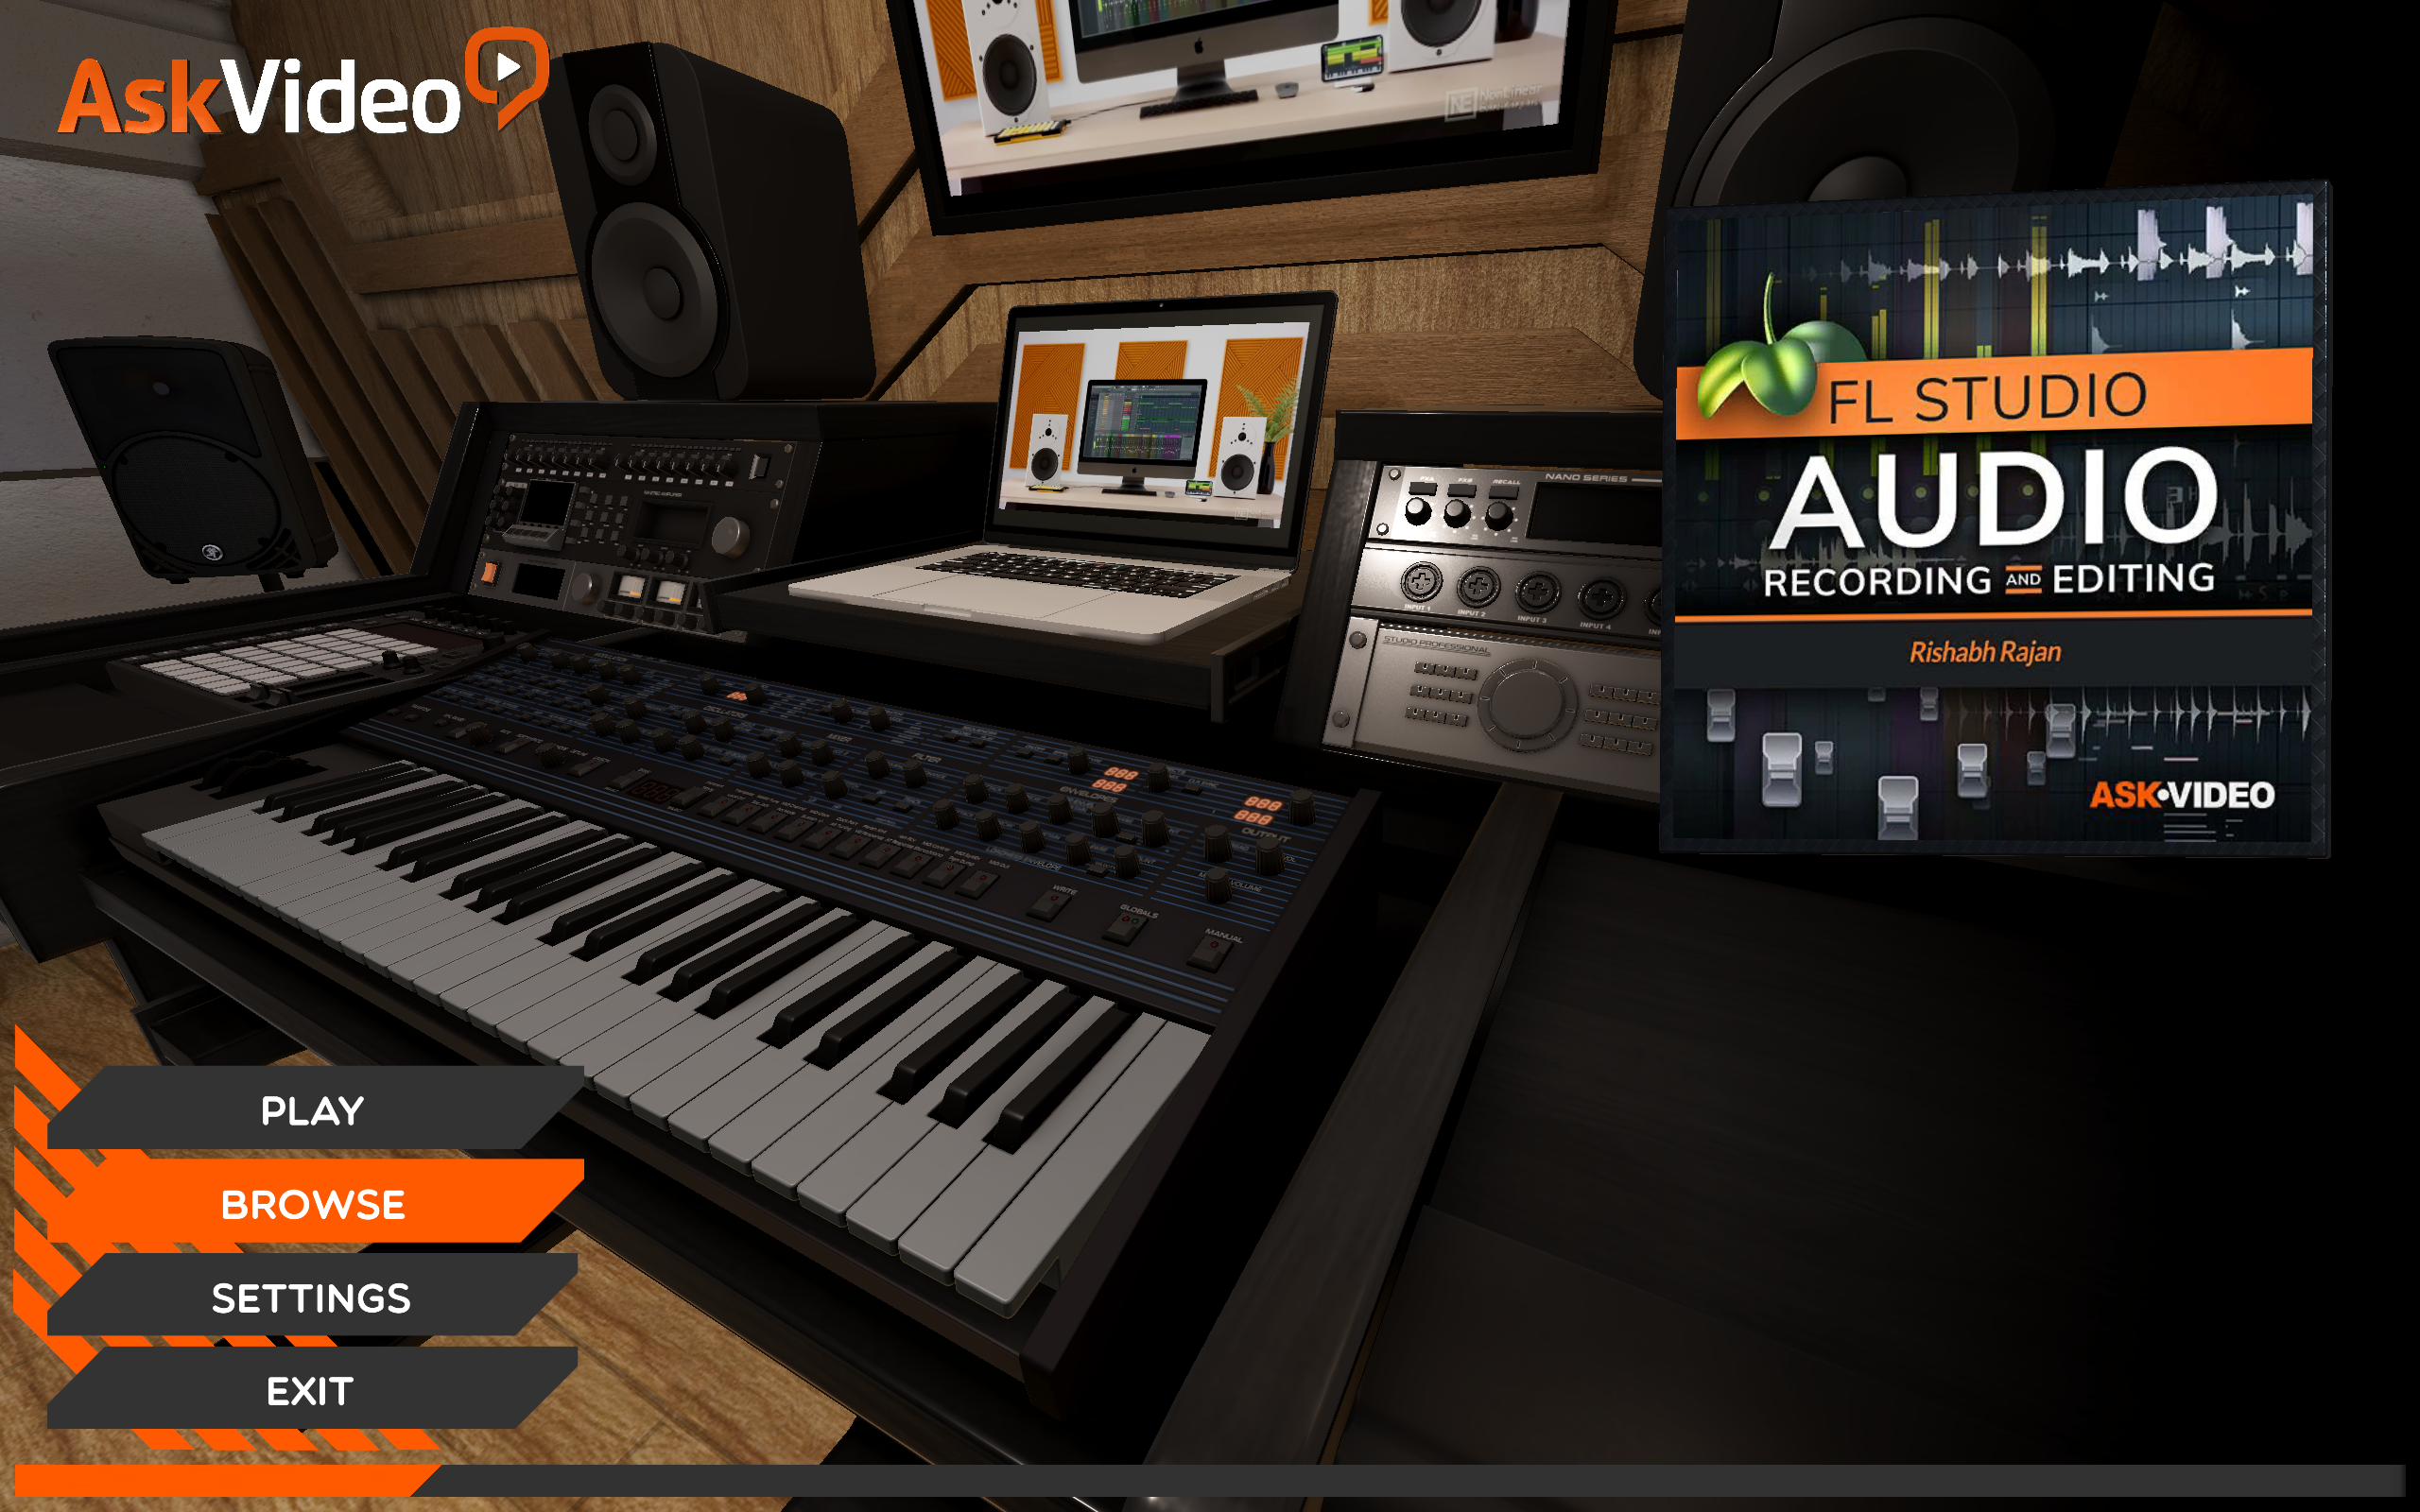 Record & Edit Audio Course in FL Studio by AV